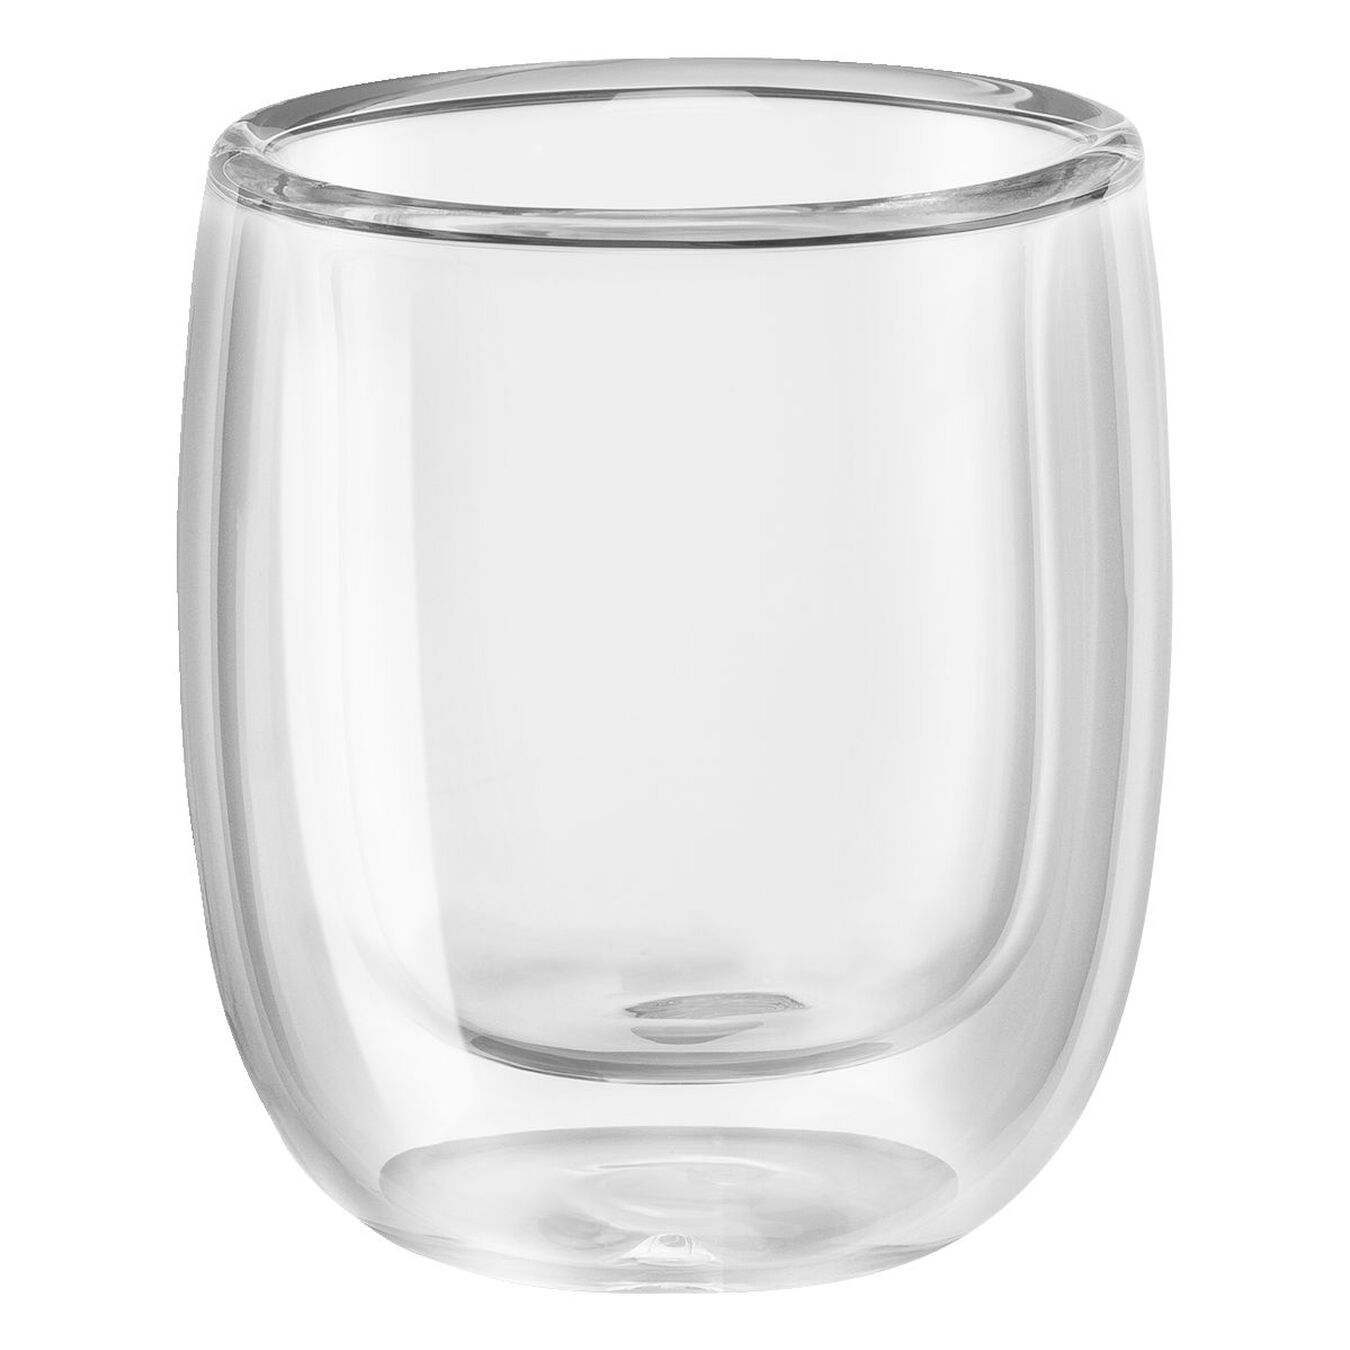 Çift Camlı Espresso bardağı seti, 2-parça,,large 3